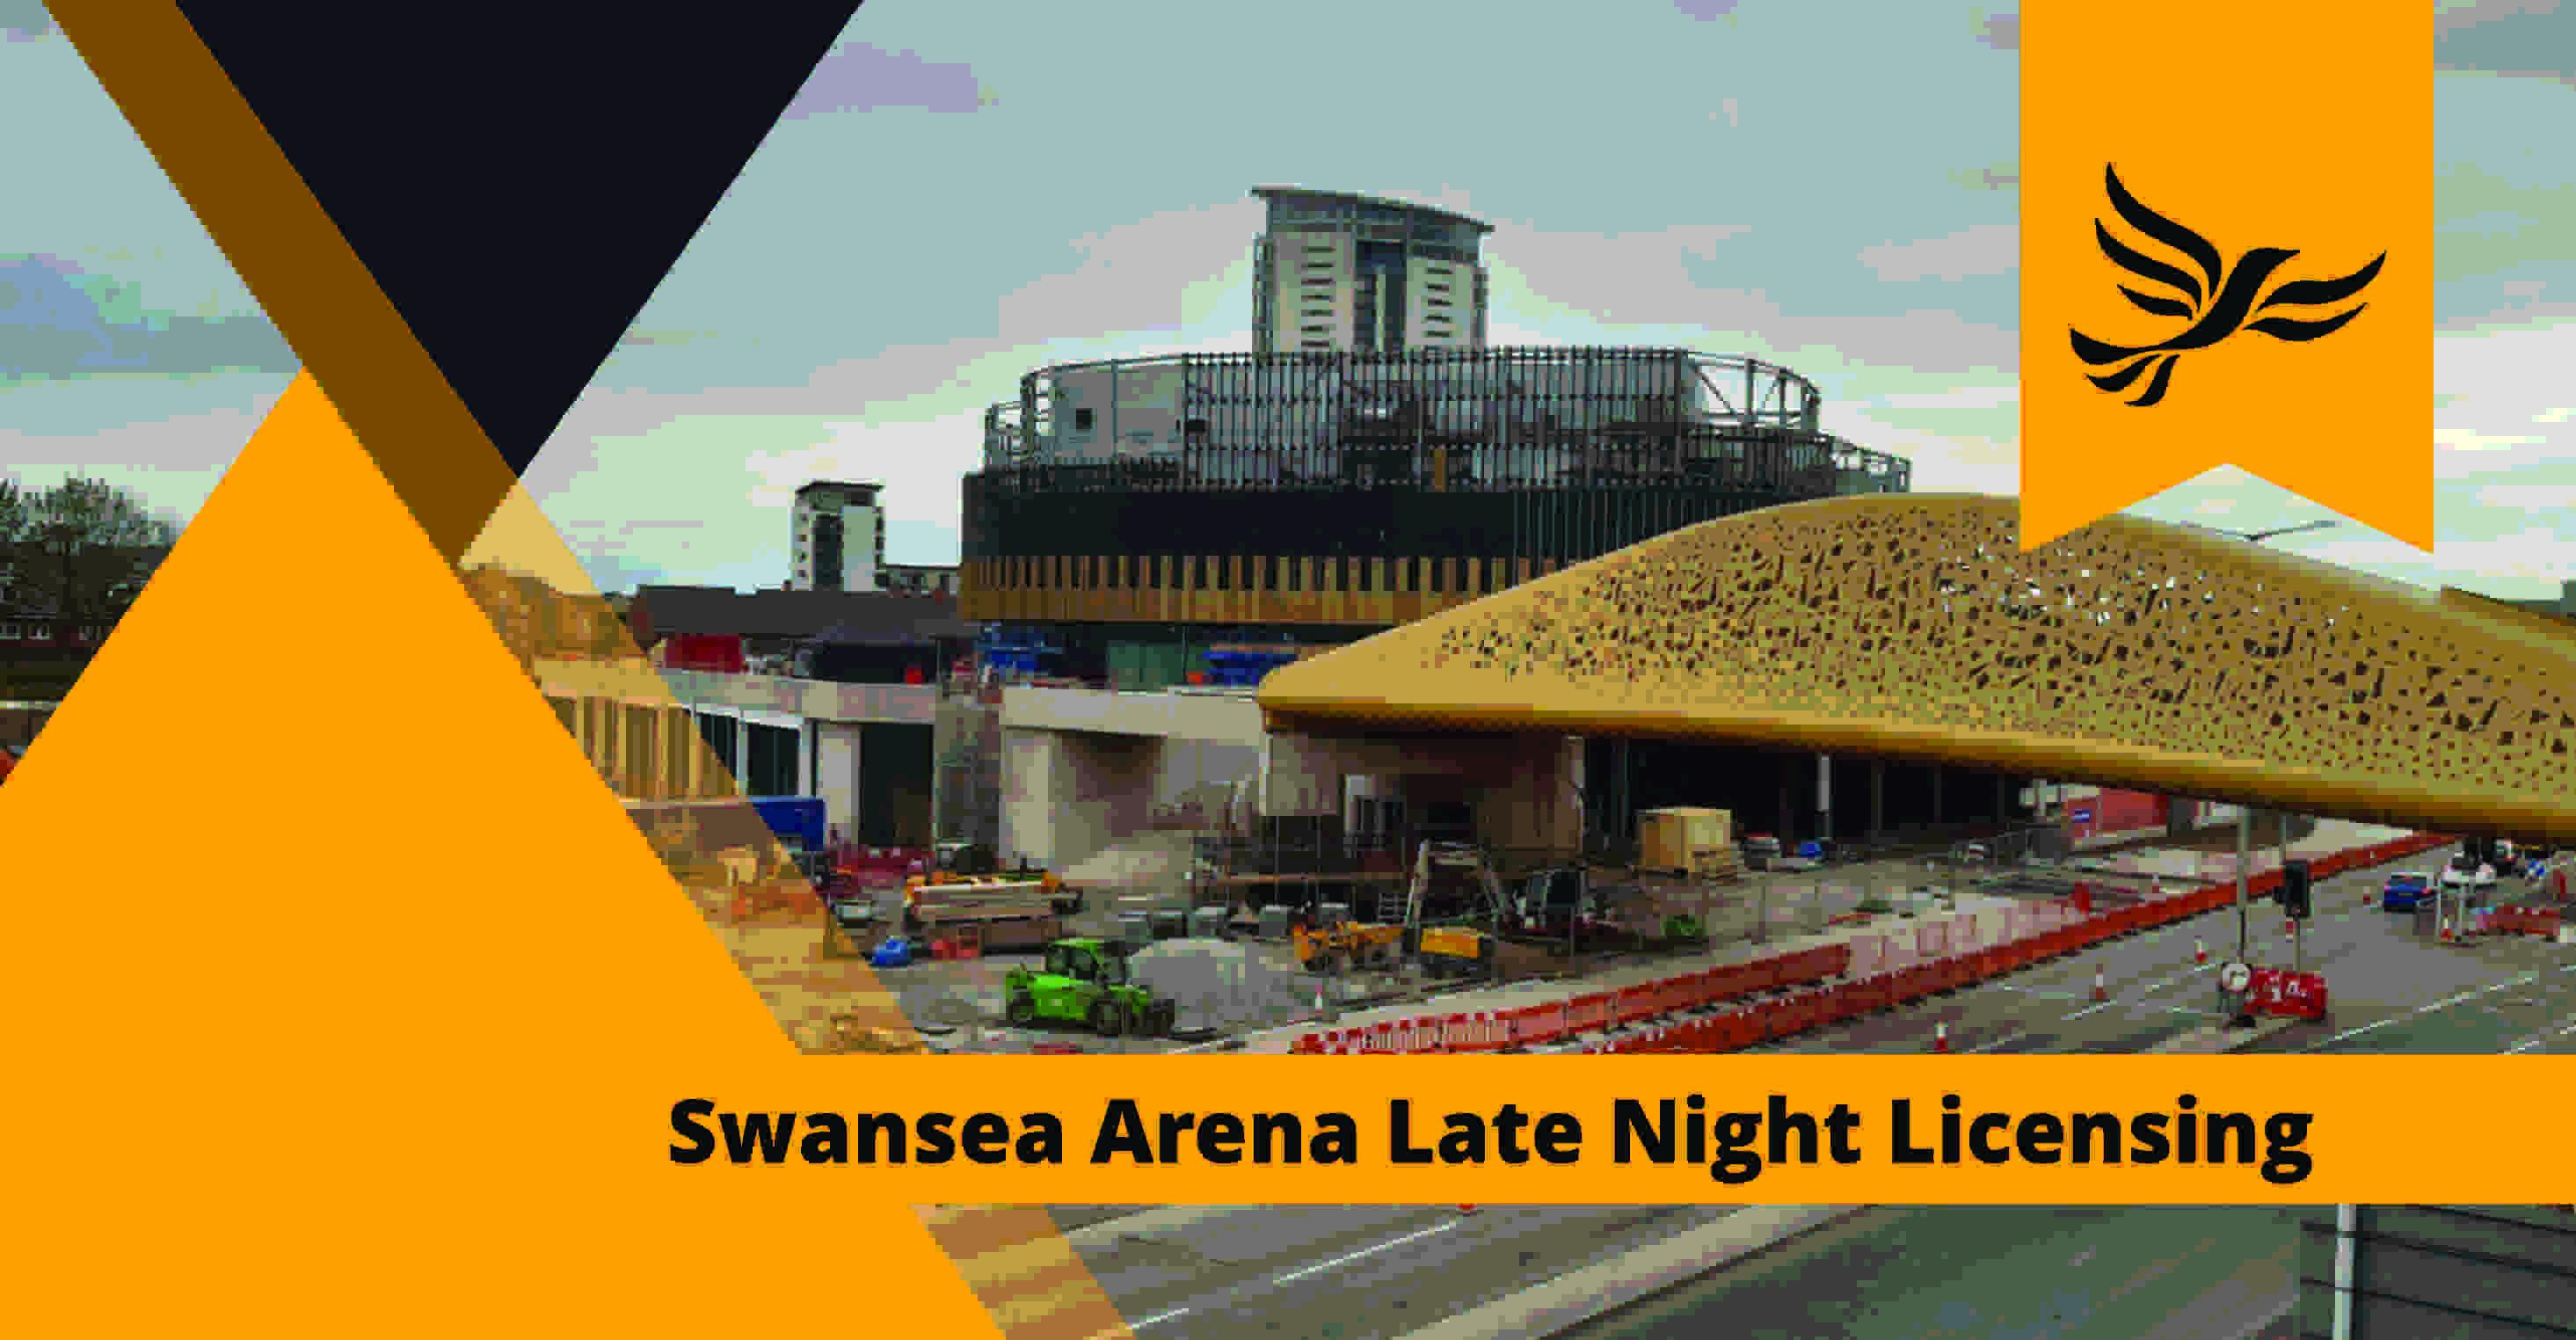 Swansea Arena Licence Concerns